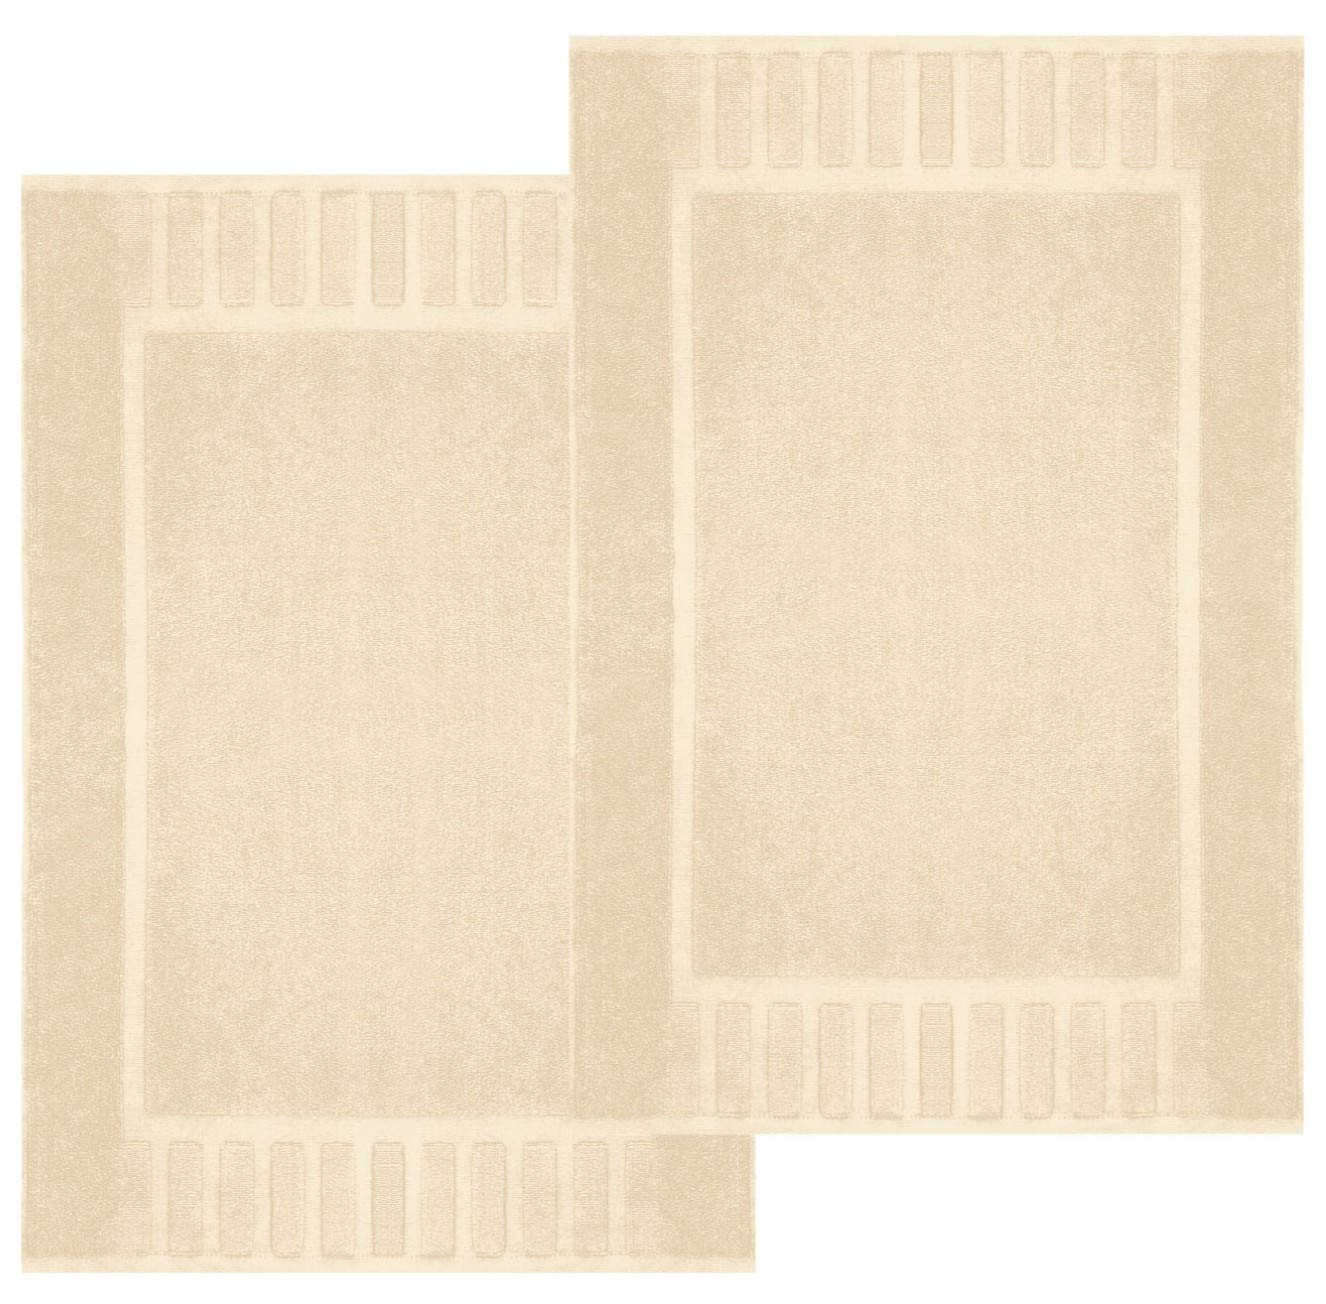 "White Classic Luxury Bath Mat Floor Towel Set - Absorbent Cotton Hotel Spa Shower/Bathtub Mats [Not a Bathroom Rug] 22""x34""   2 Pack   Beige"